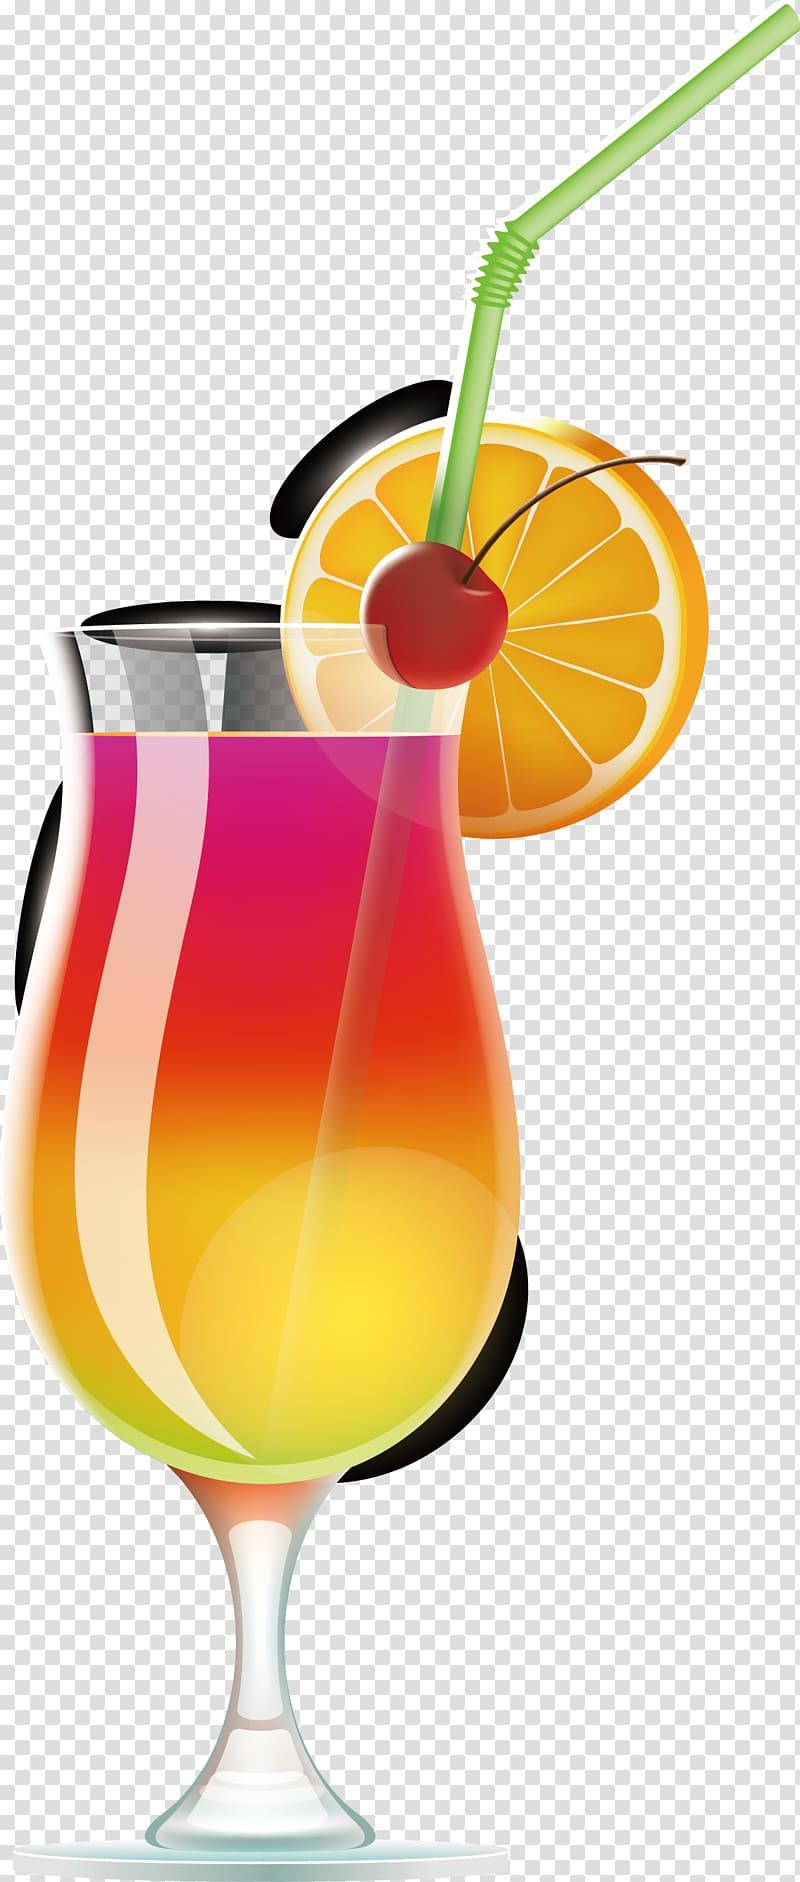 Wine cocktail Juice Tequila Sunrise Margarita, Summer drinks.